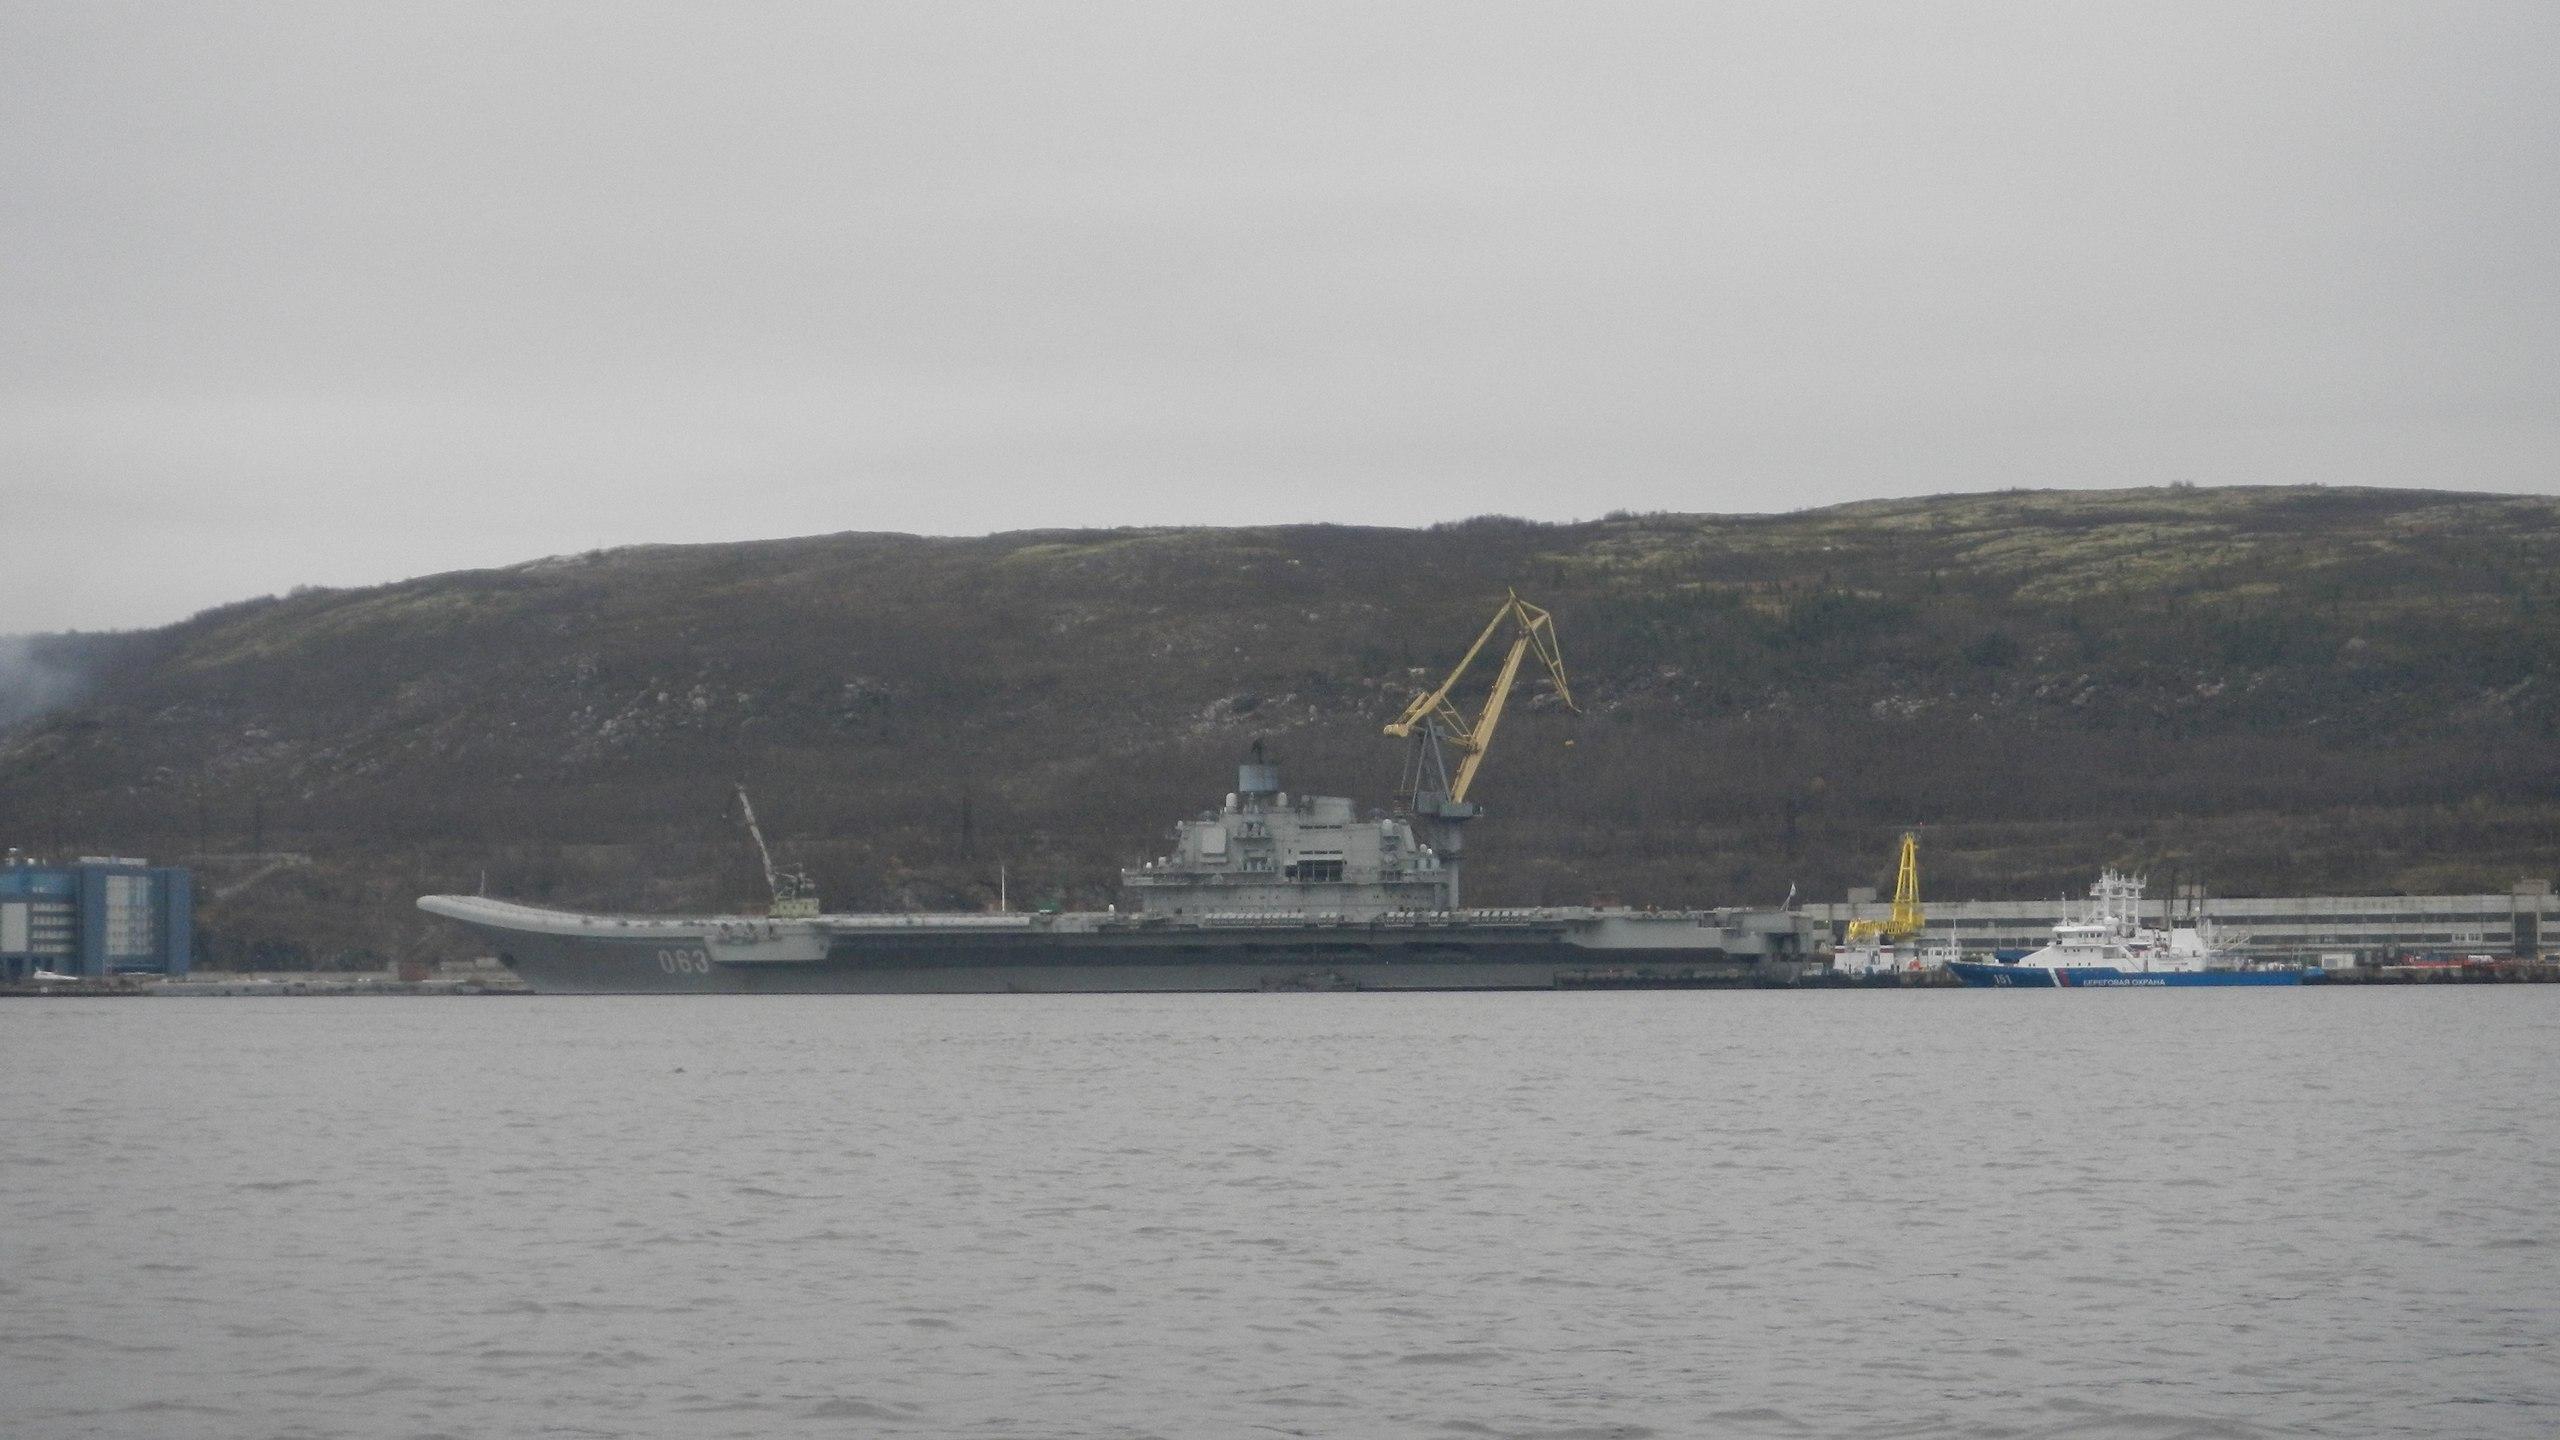 Orosz hadiflotta RaQgsydHU-Y